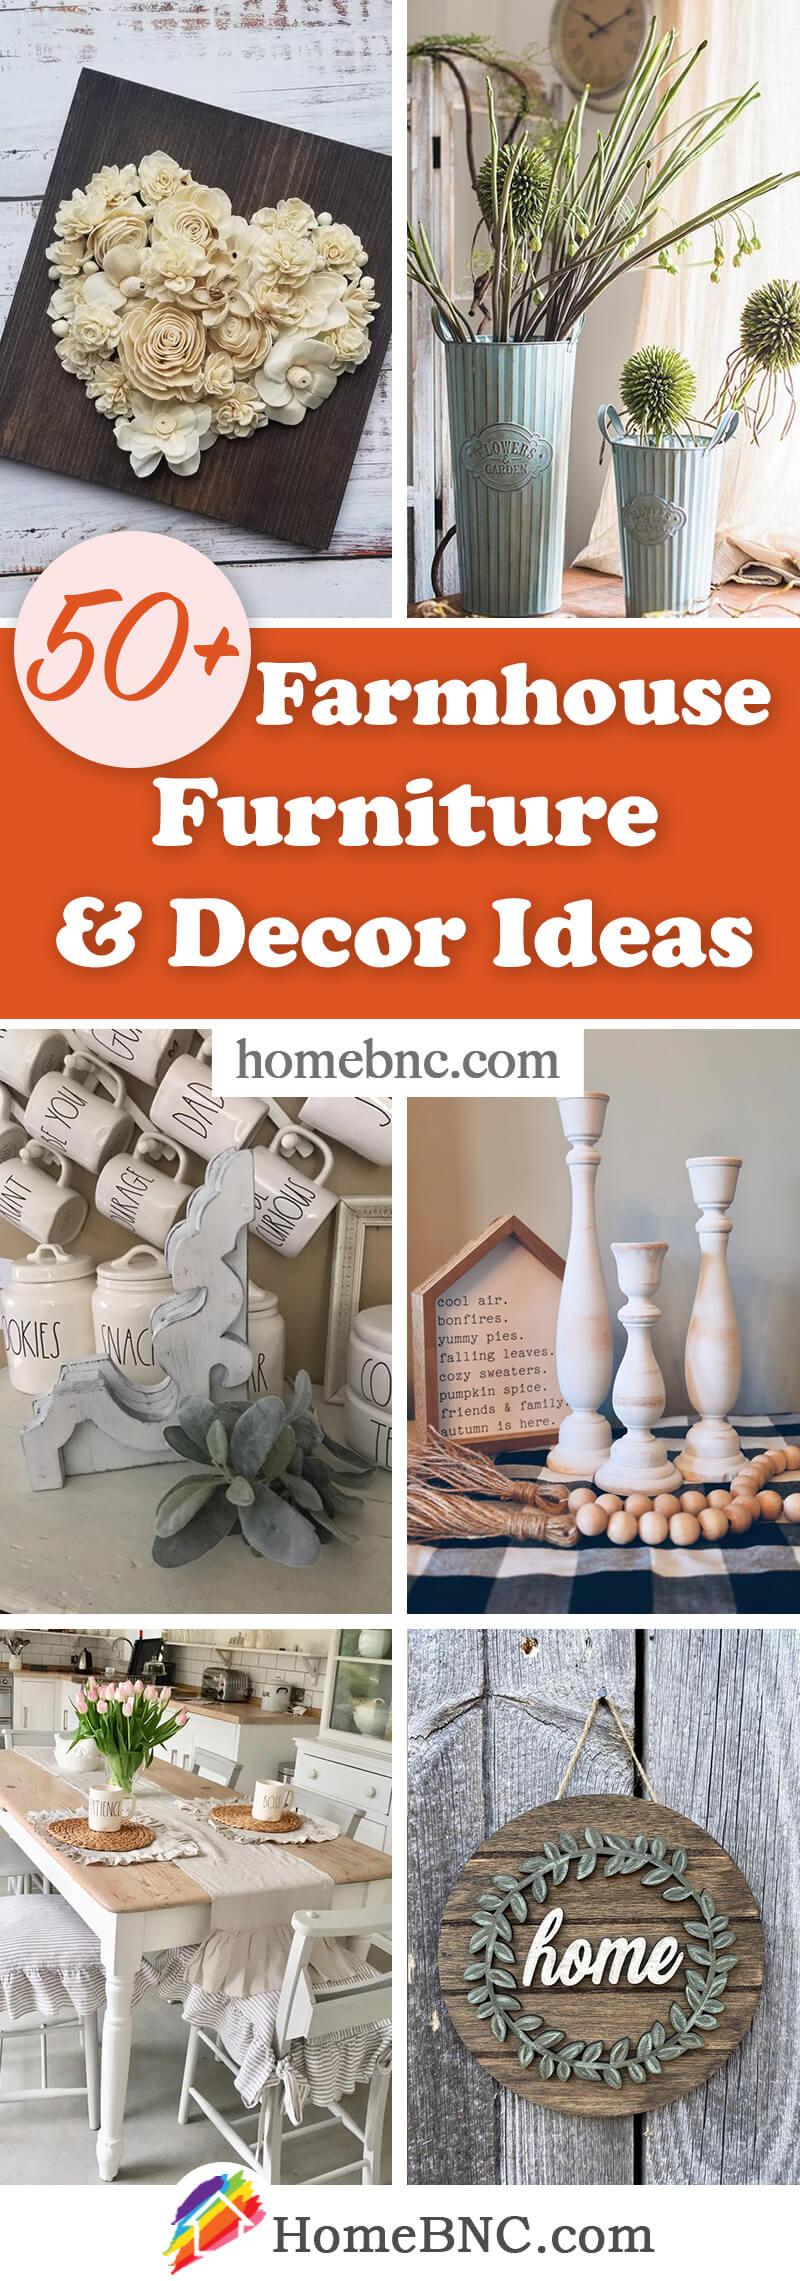 Farmhouse Furniture and Decorations